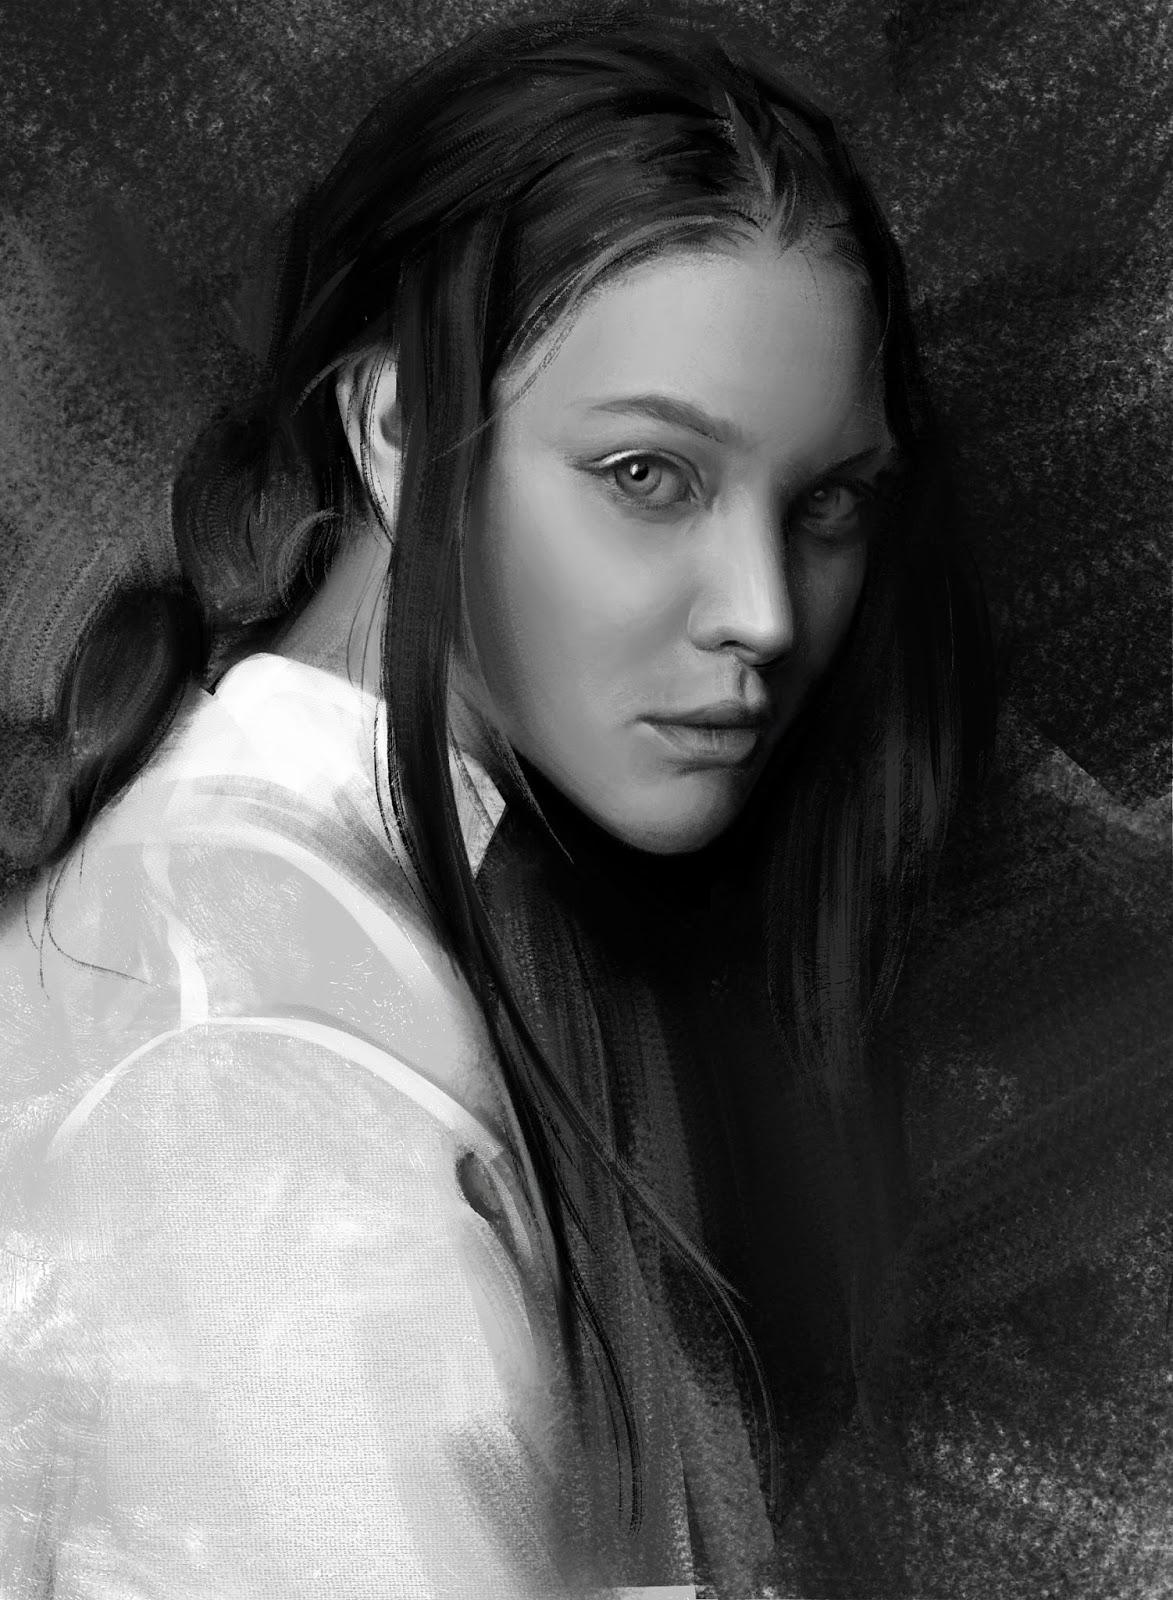 Monika Ewa Orlowska